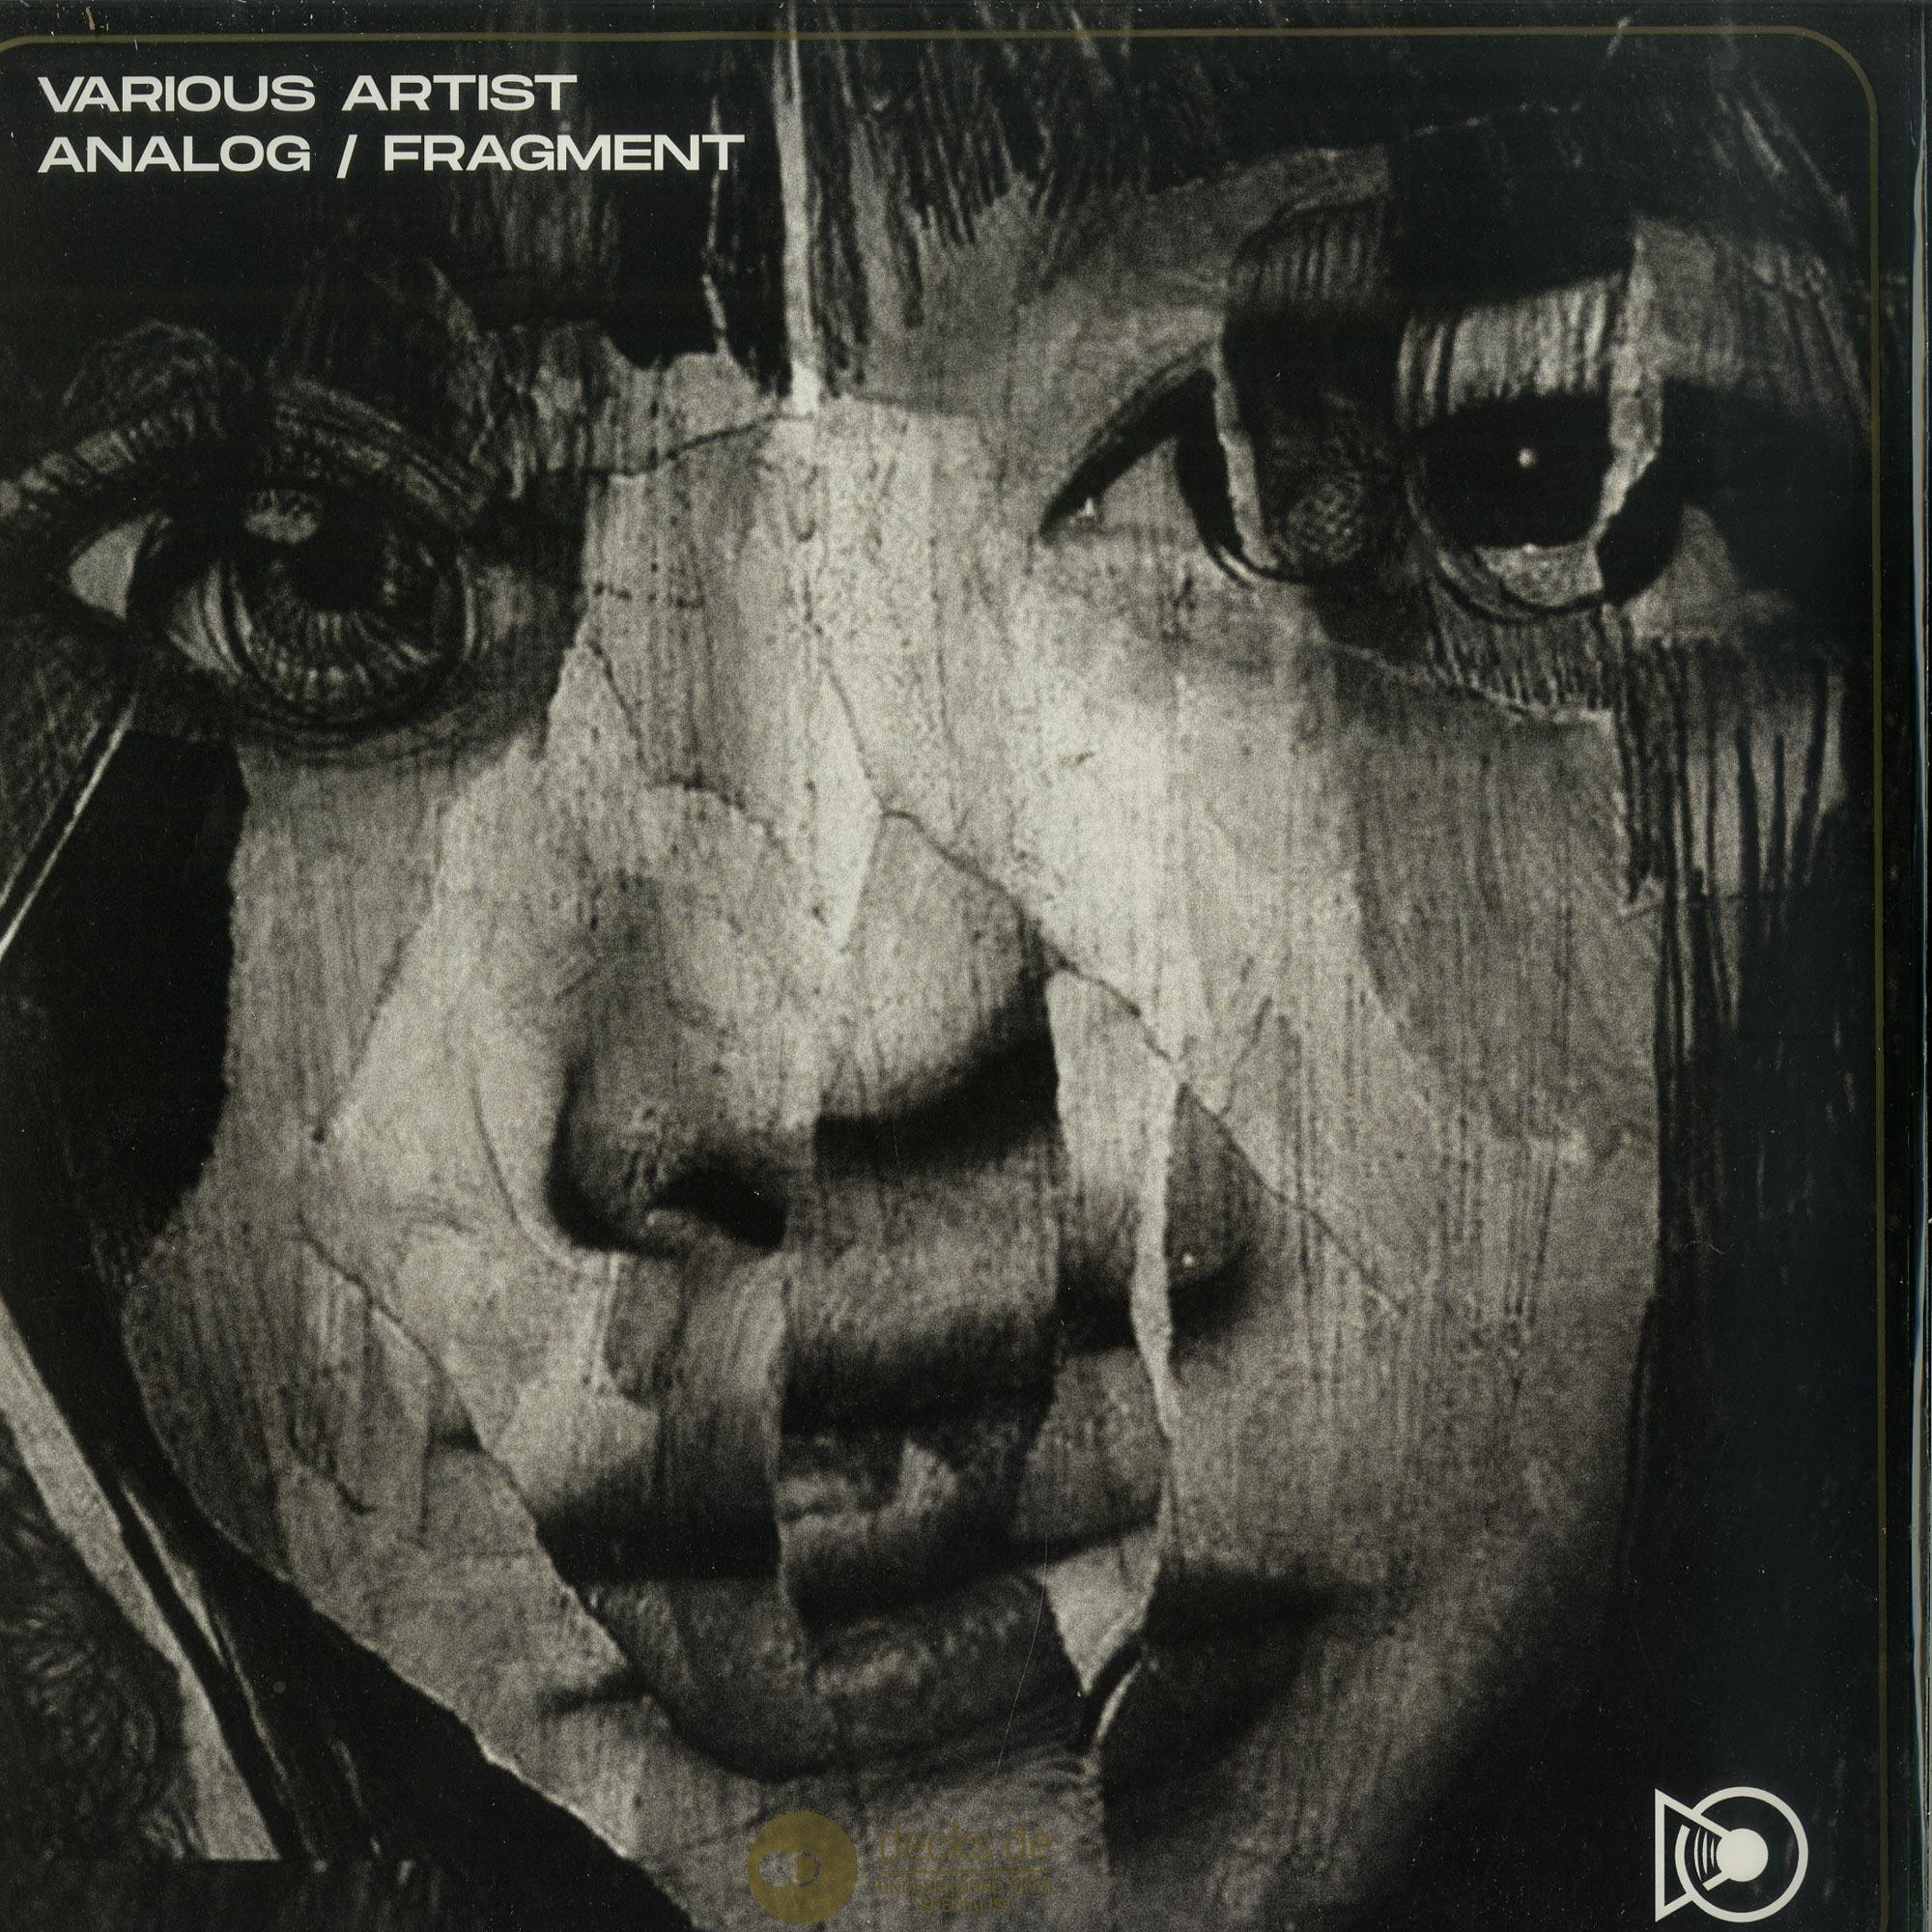 Various Artists - ANALOG / FRAGMENT